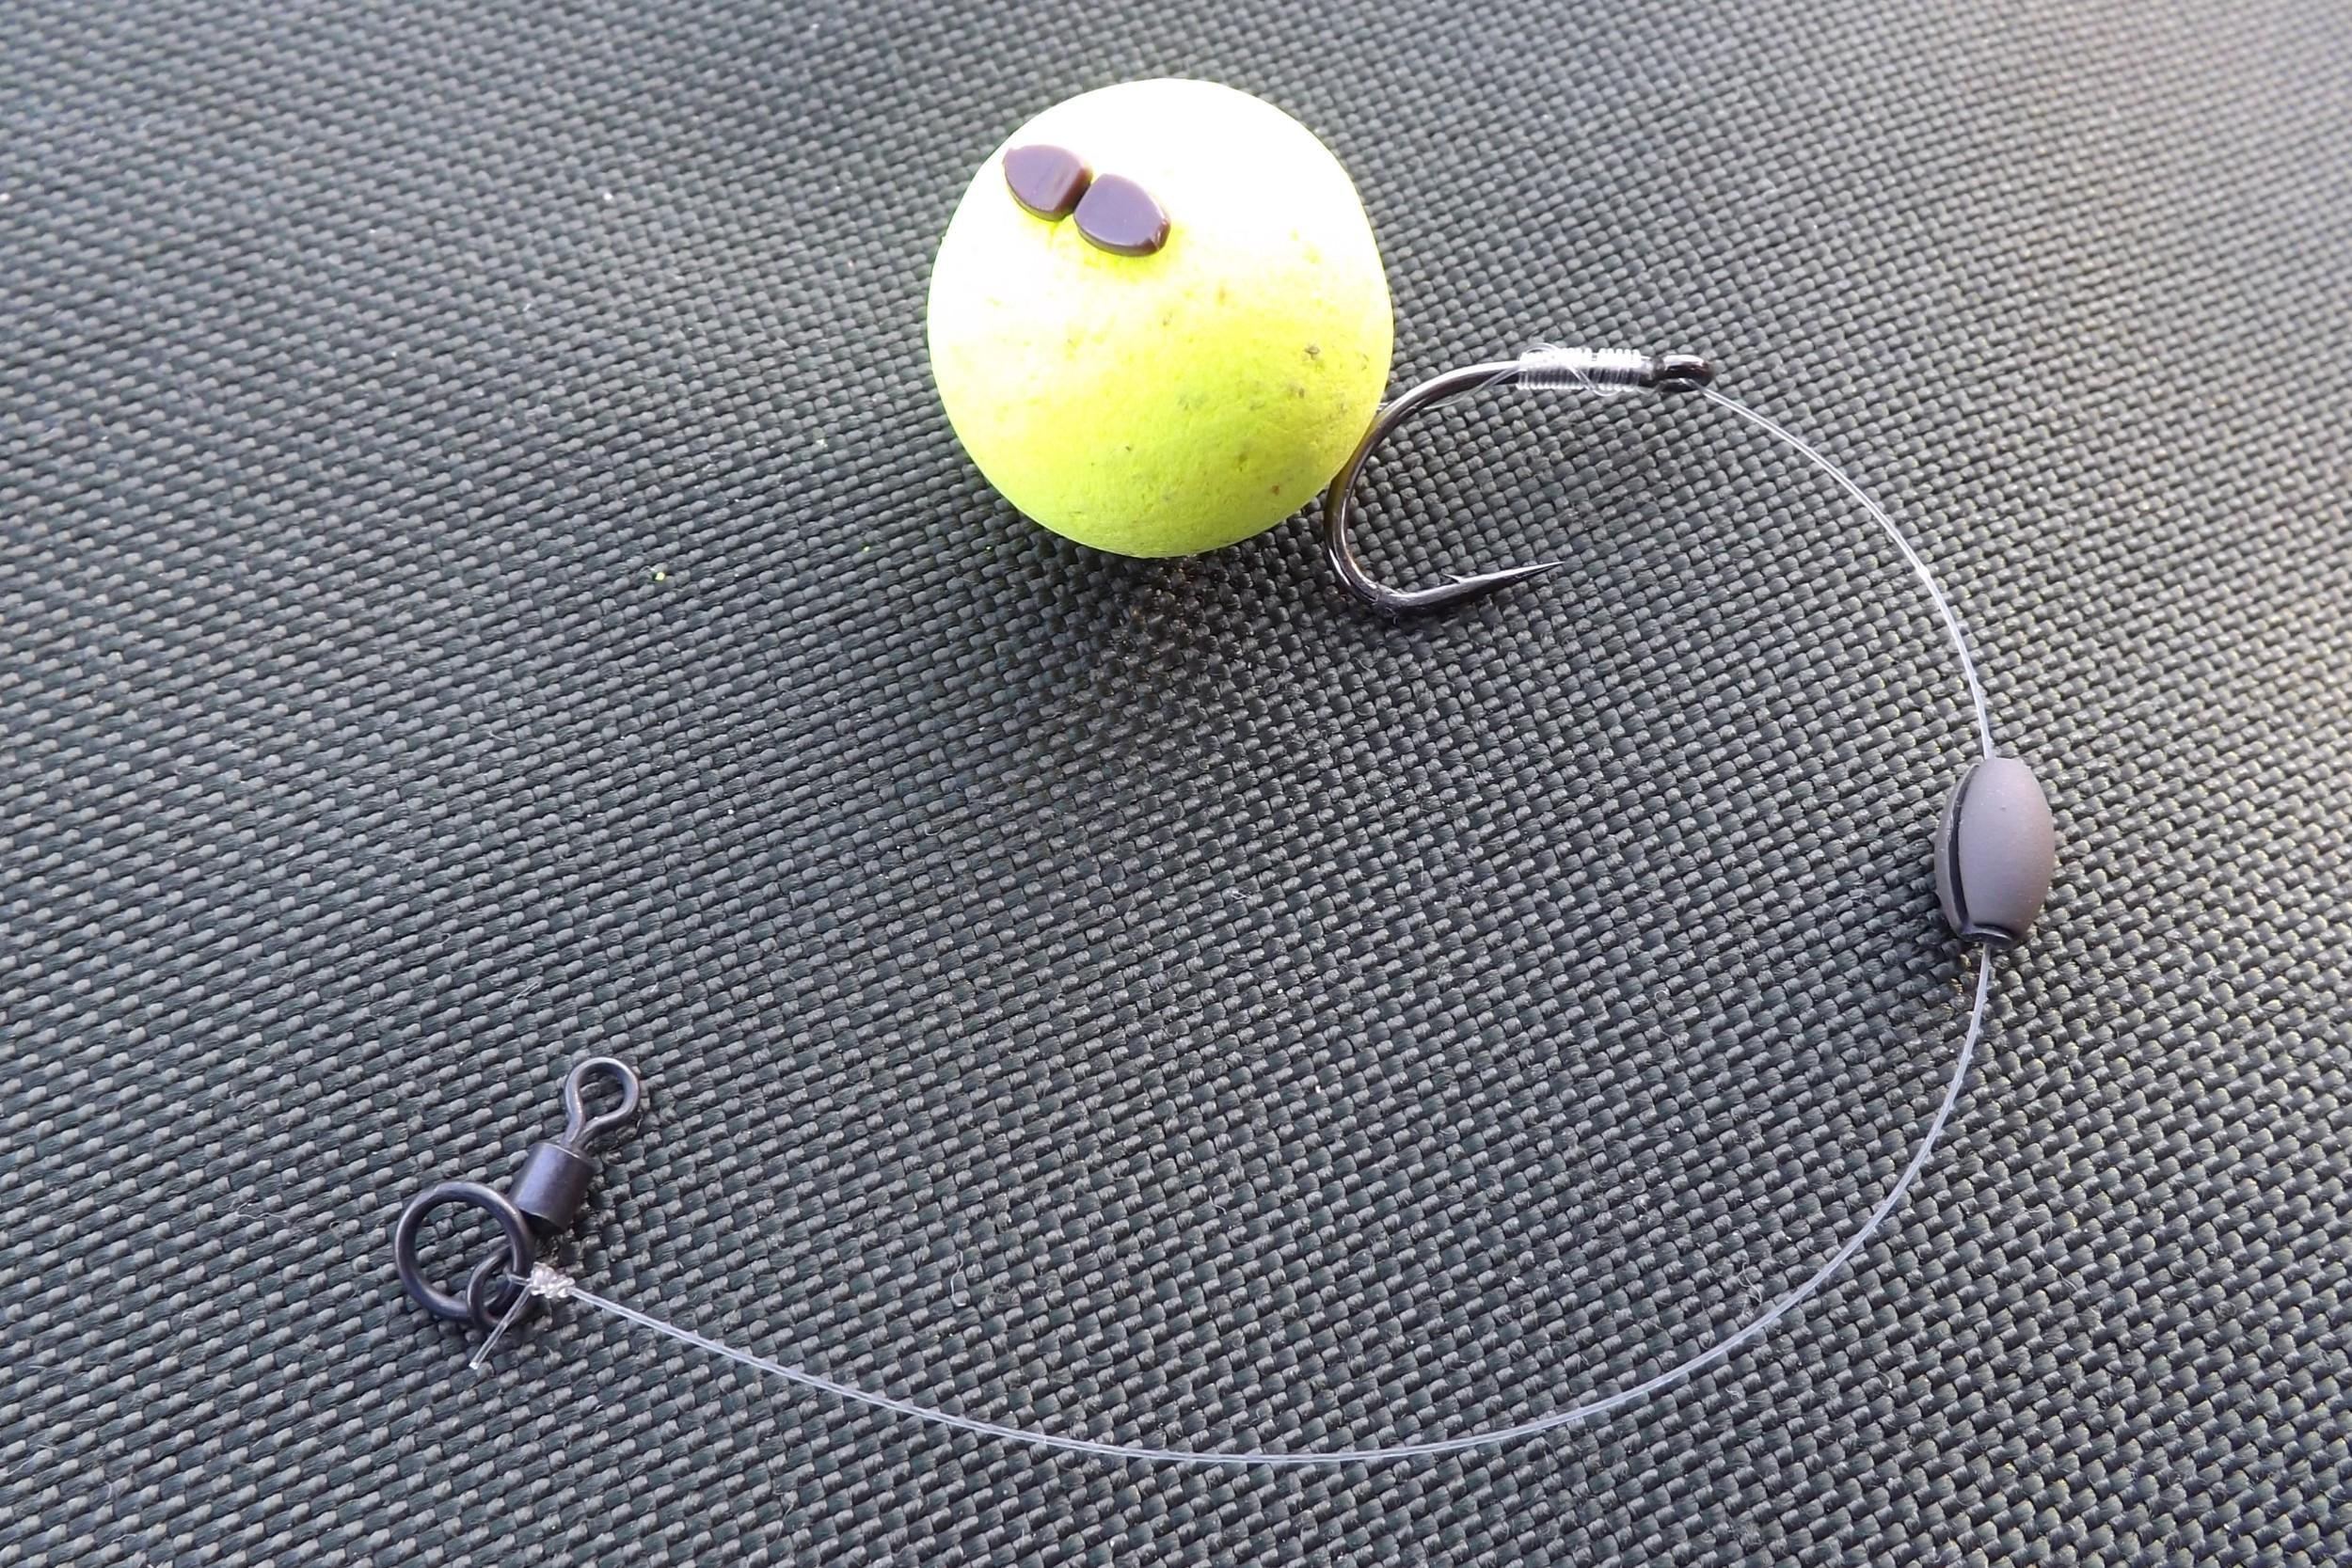 Pop-up et pêche au method feeder.